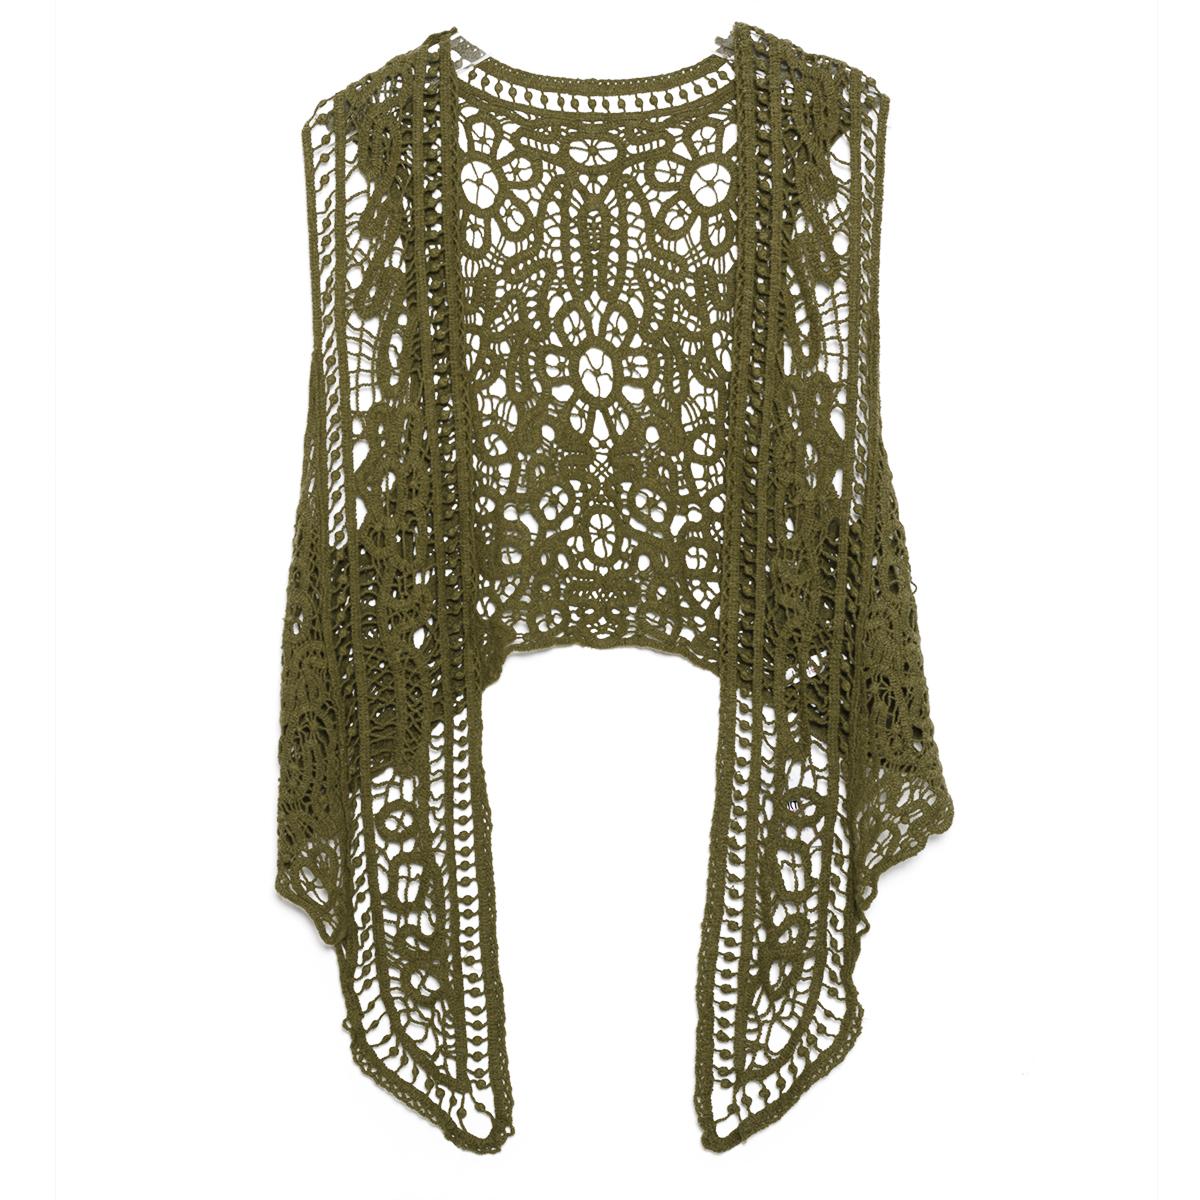 Jastie Asymmetric Open Stitch Cardigan Summer Beach Boho Hippie People Style Crochet Knit Embroidery Blouse Sleeveless Vest C19041201